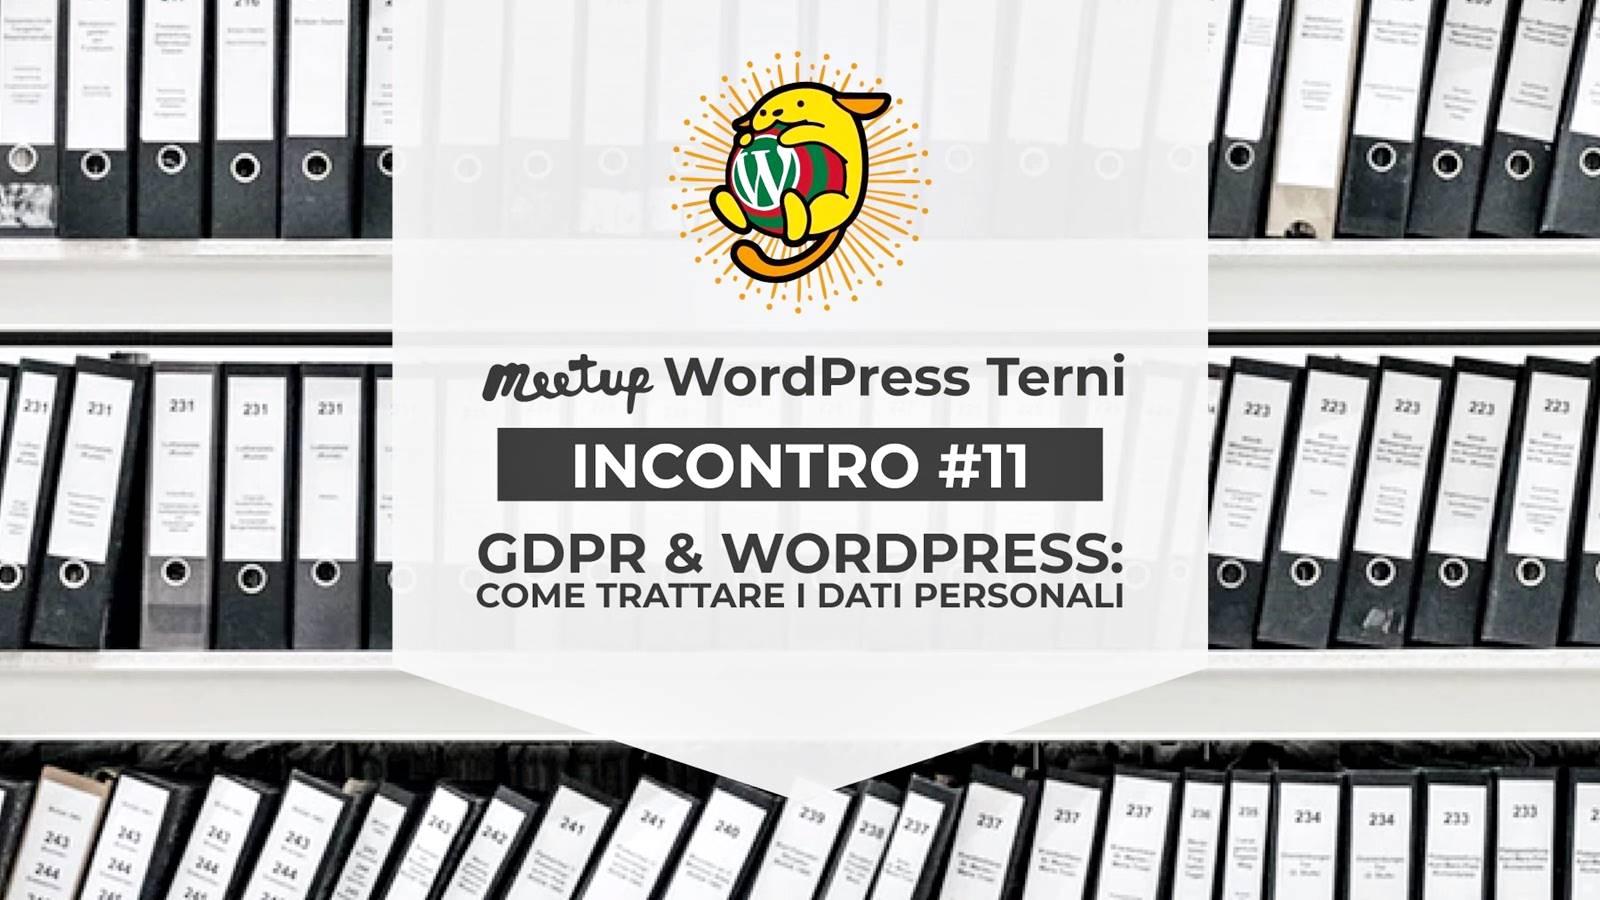 WordPress Meetup Terni #11 - GDPR & WP: trattare i dati personali sui siti web